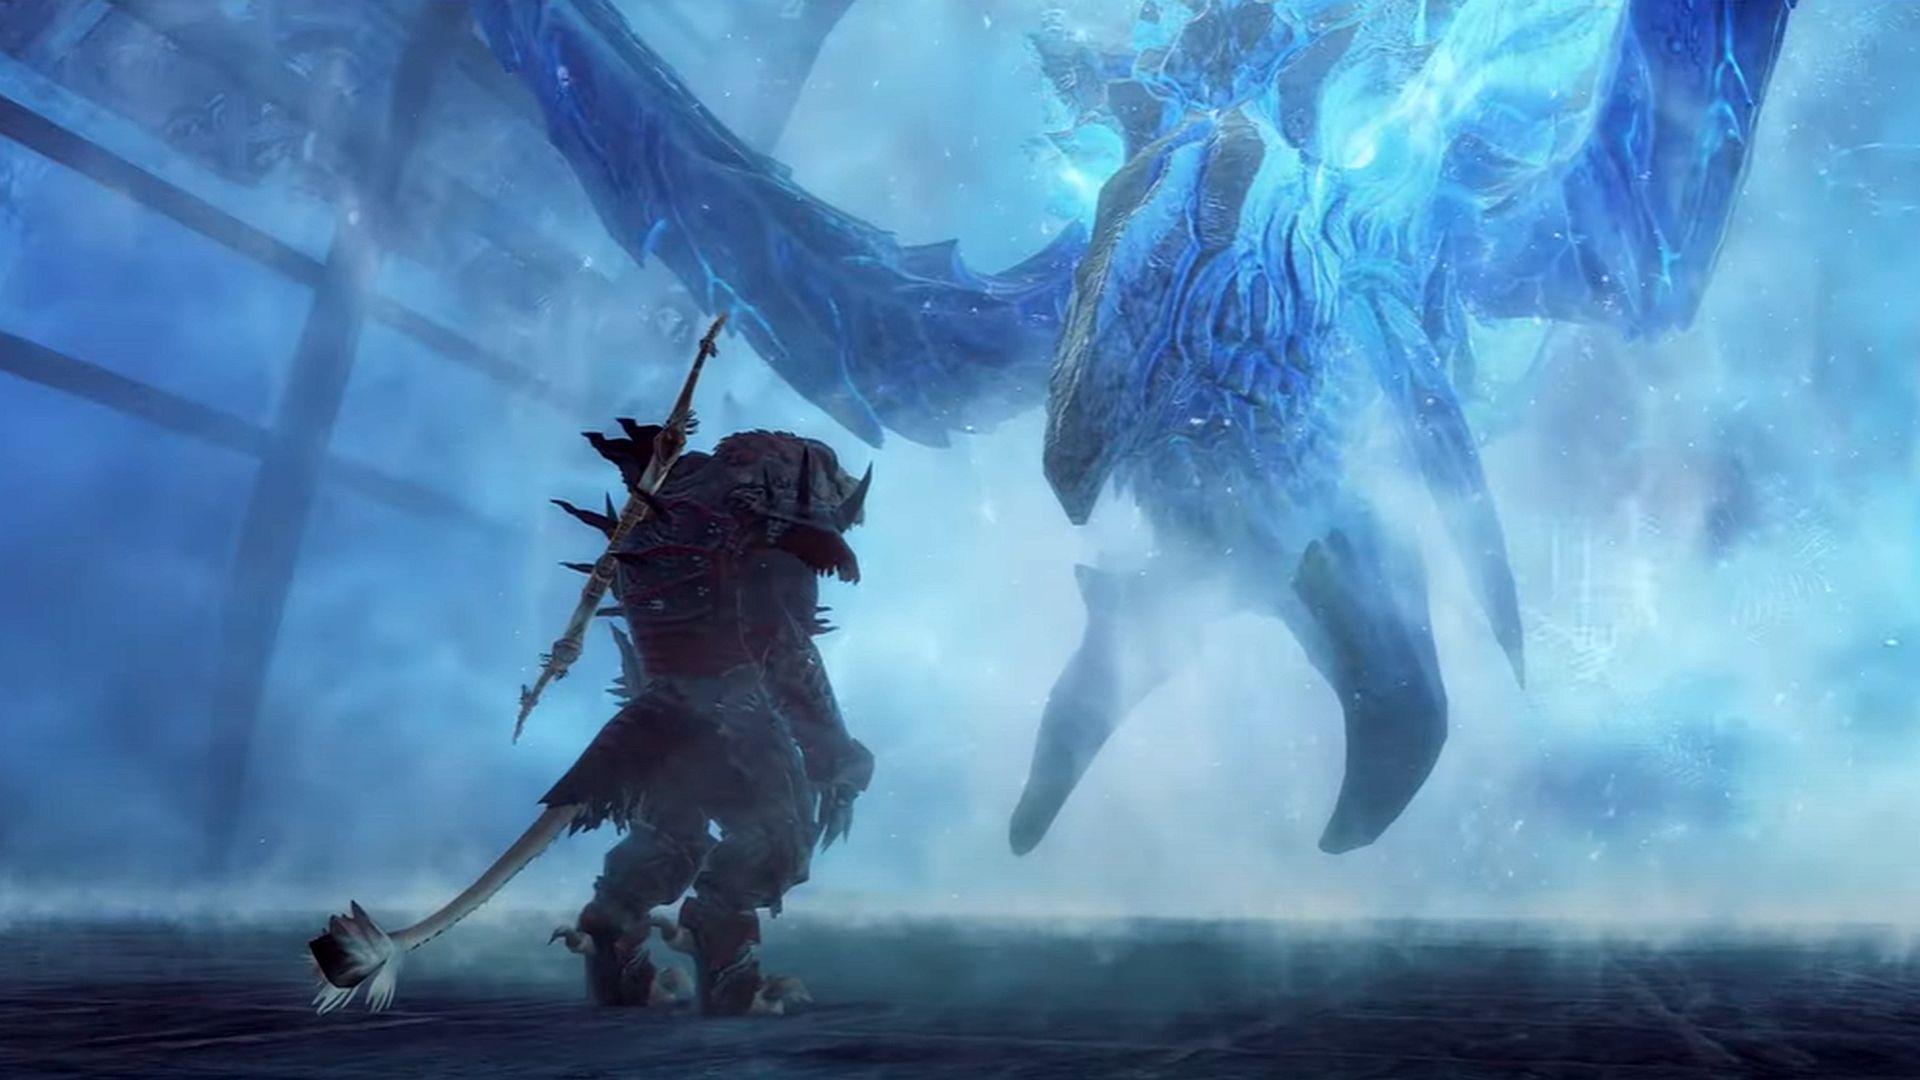 Guild Wars 2's Icebrood Saga finale launches next week